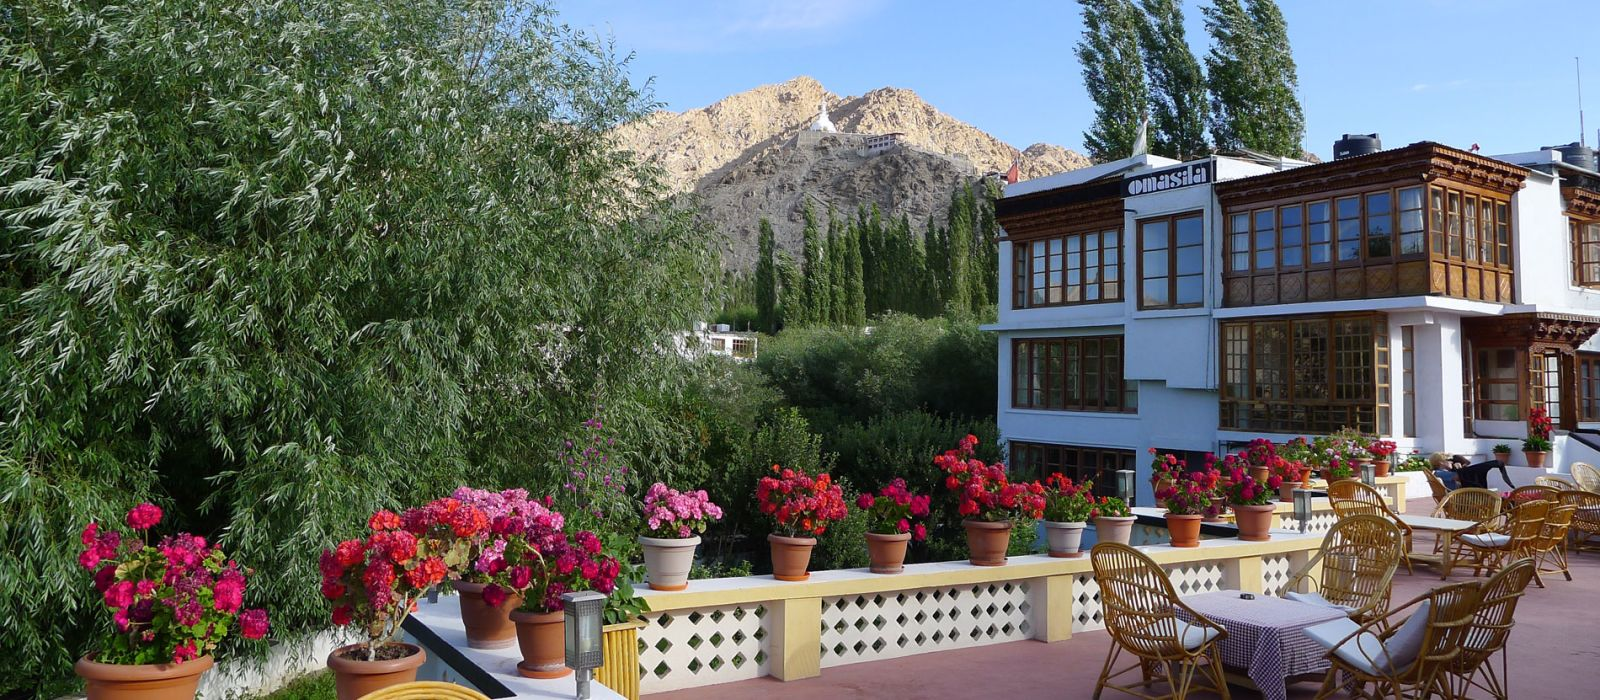 Hotel Omasila Himalaja